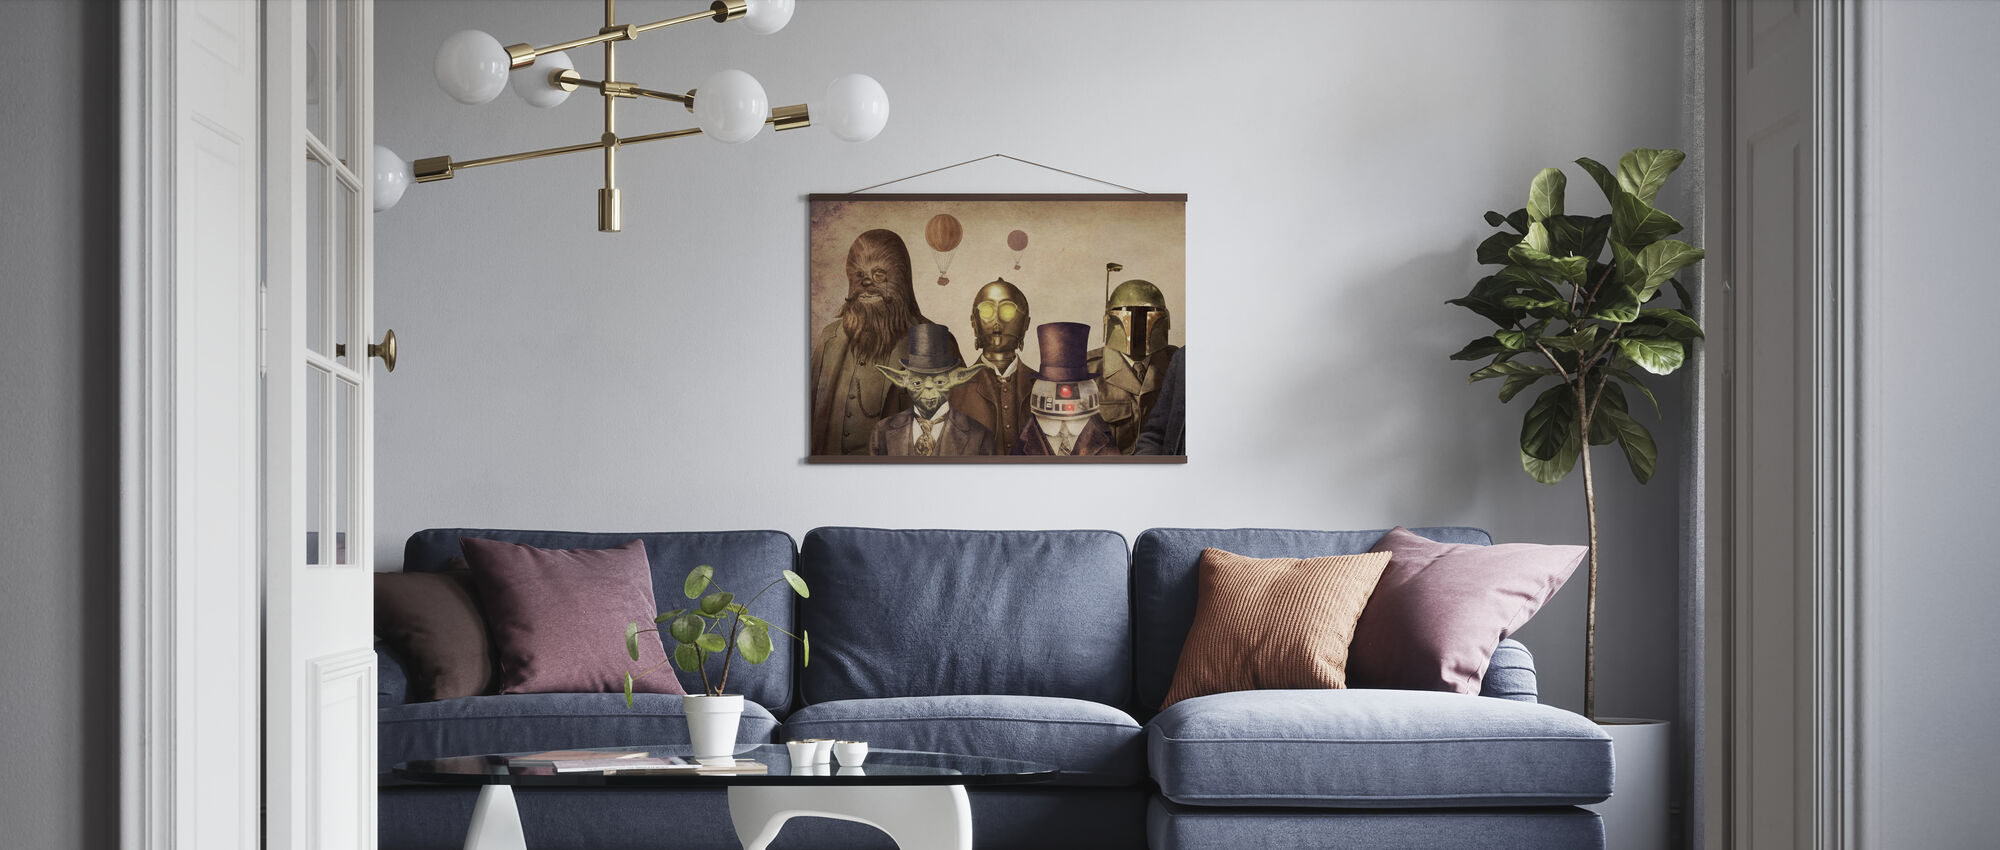 Victorian Wars - Poster - Living Room